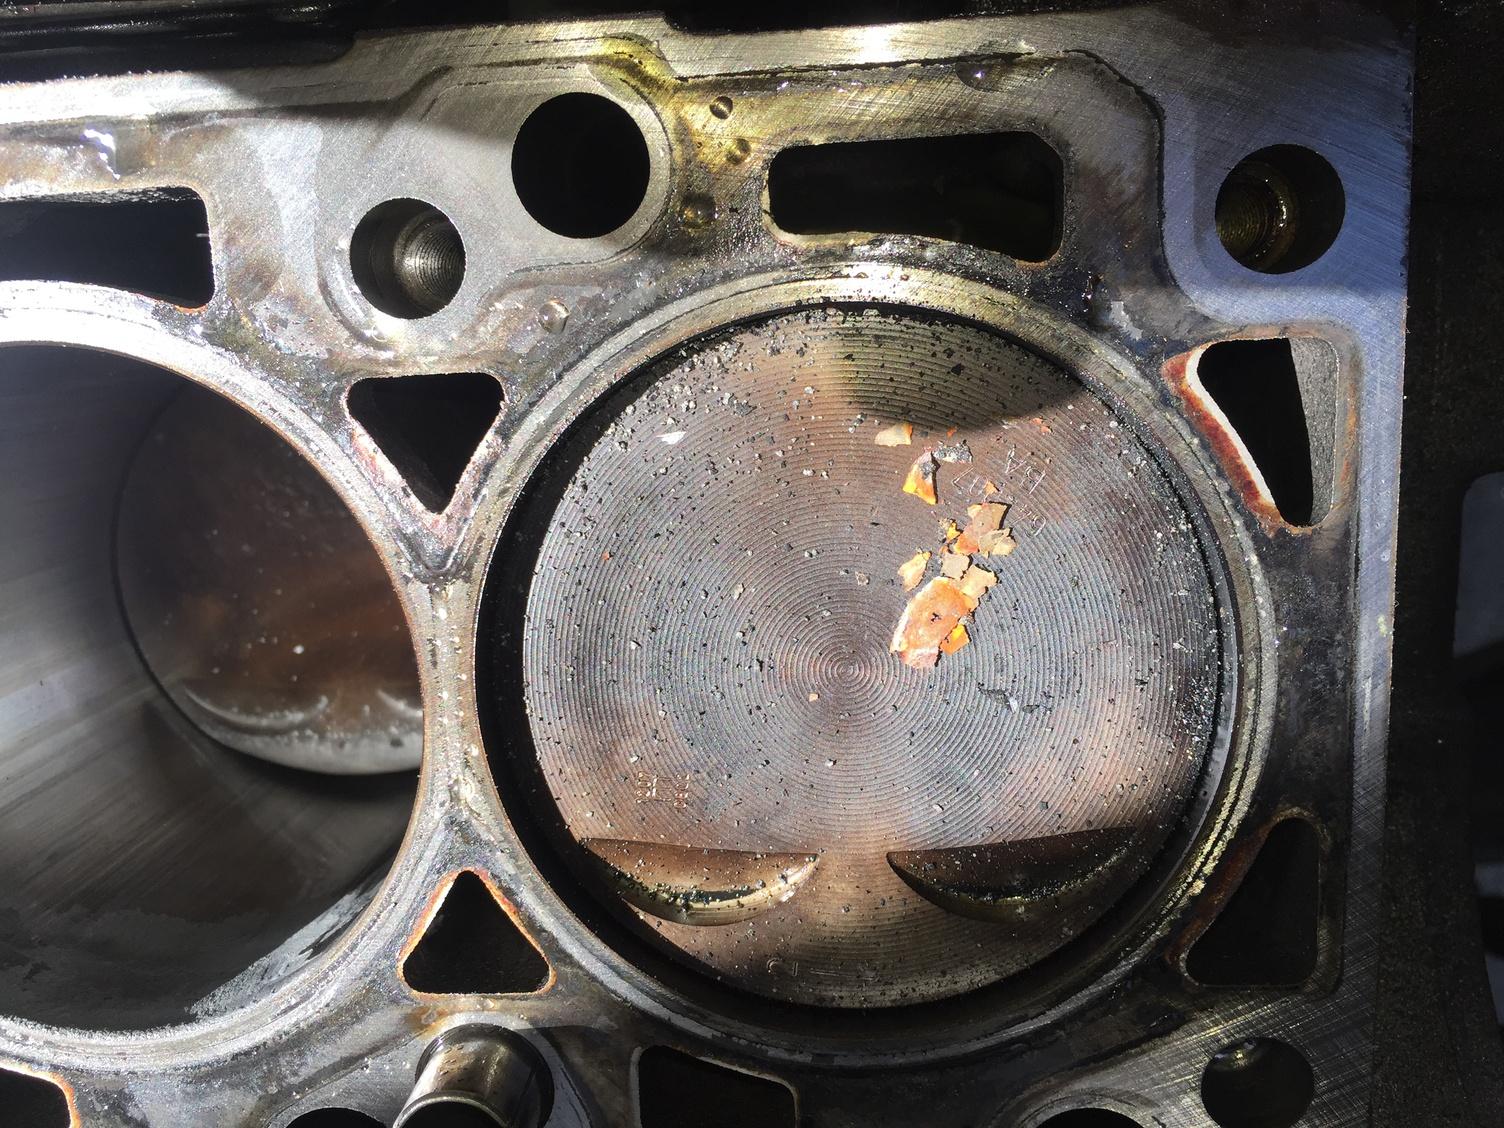 piston rings fried, need rebuild advice-014.jpg